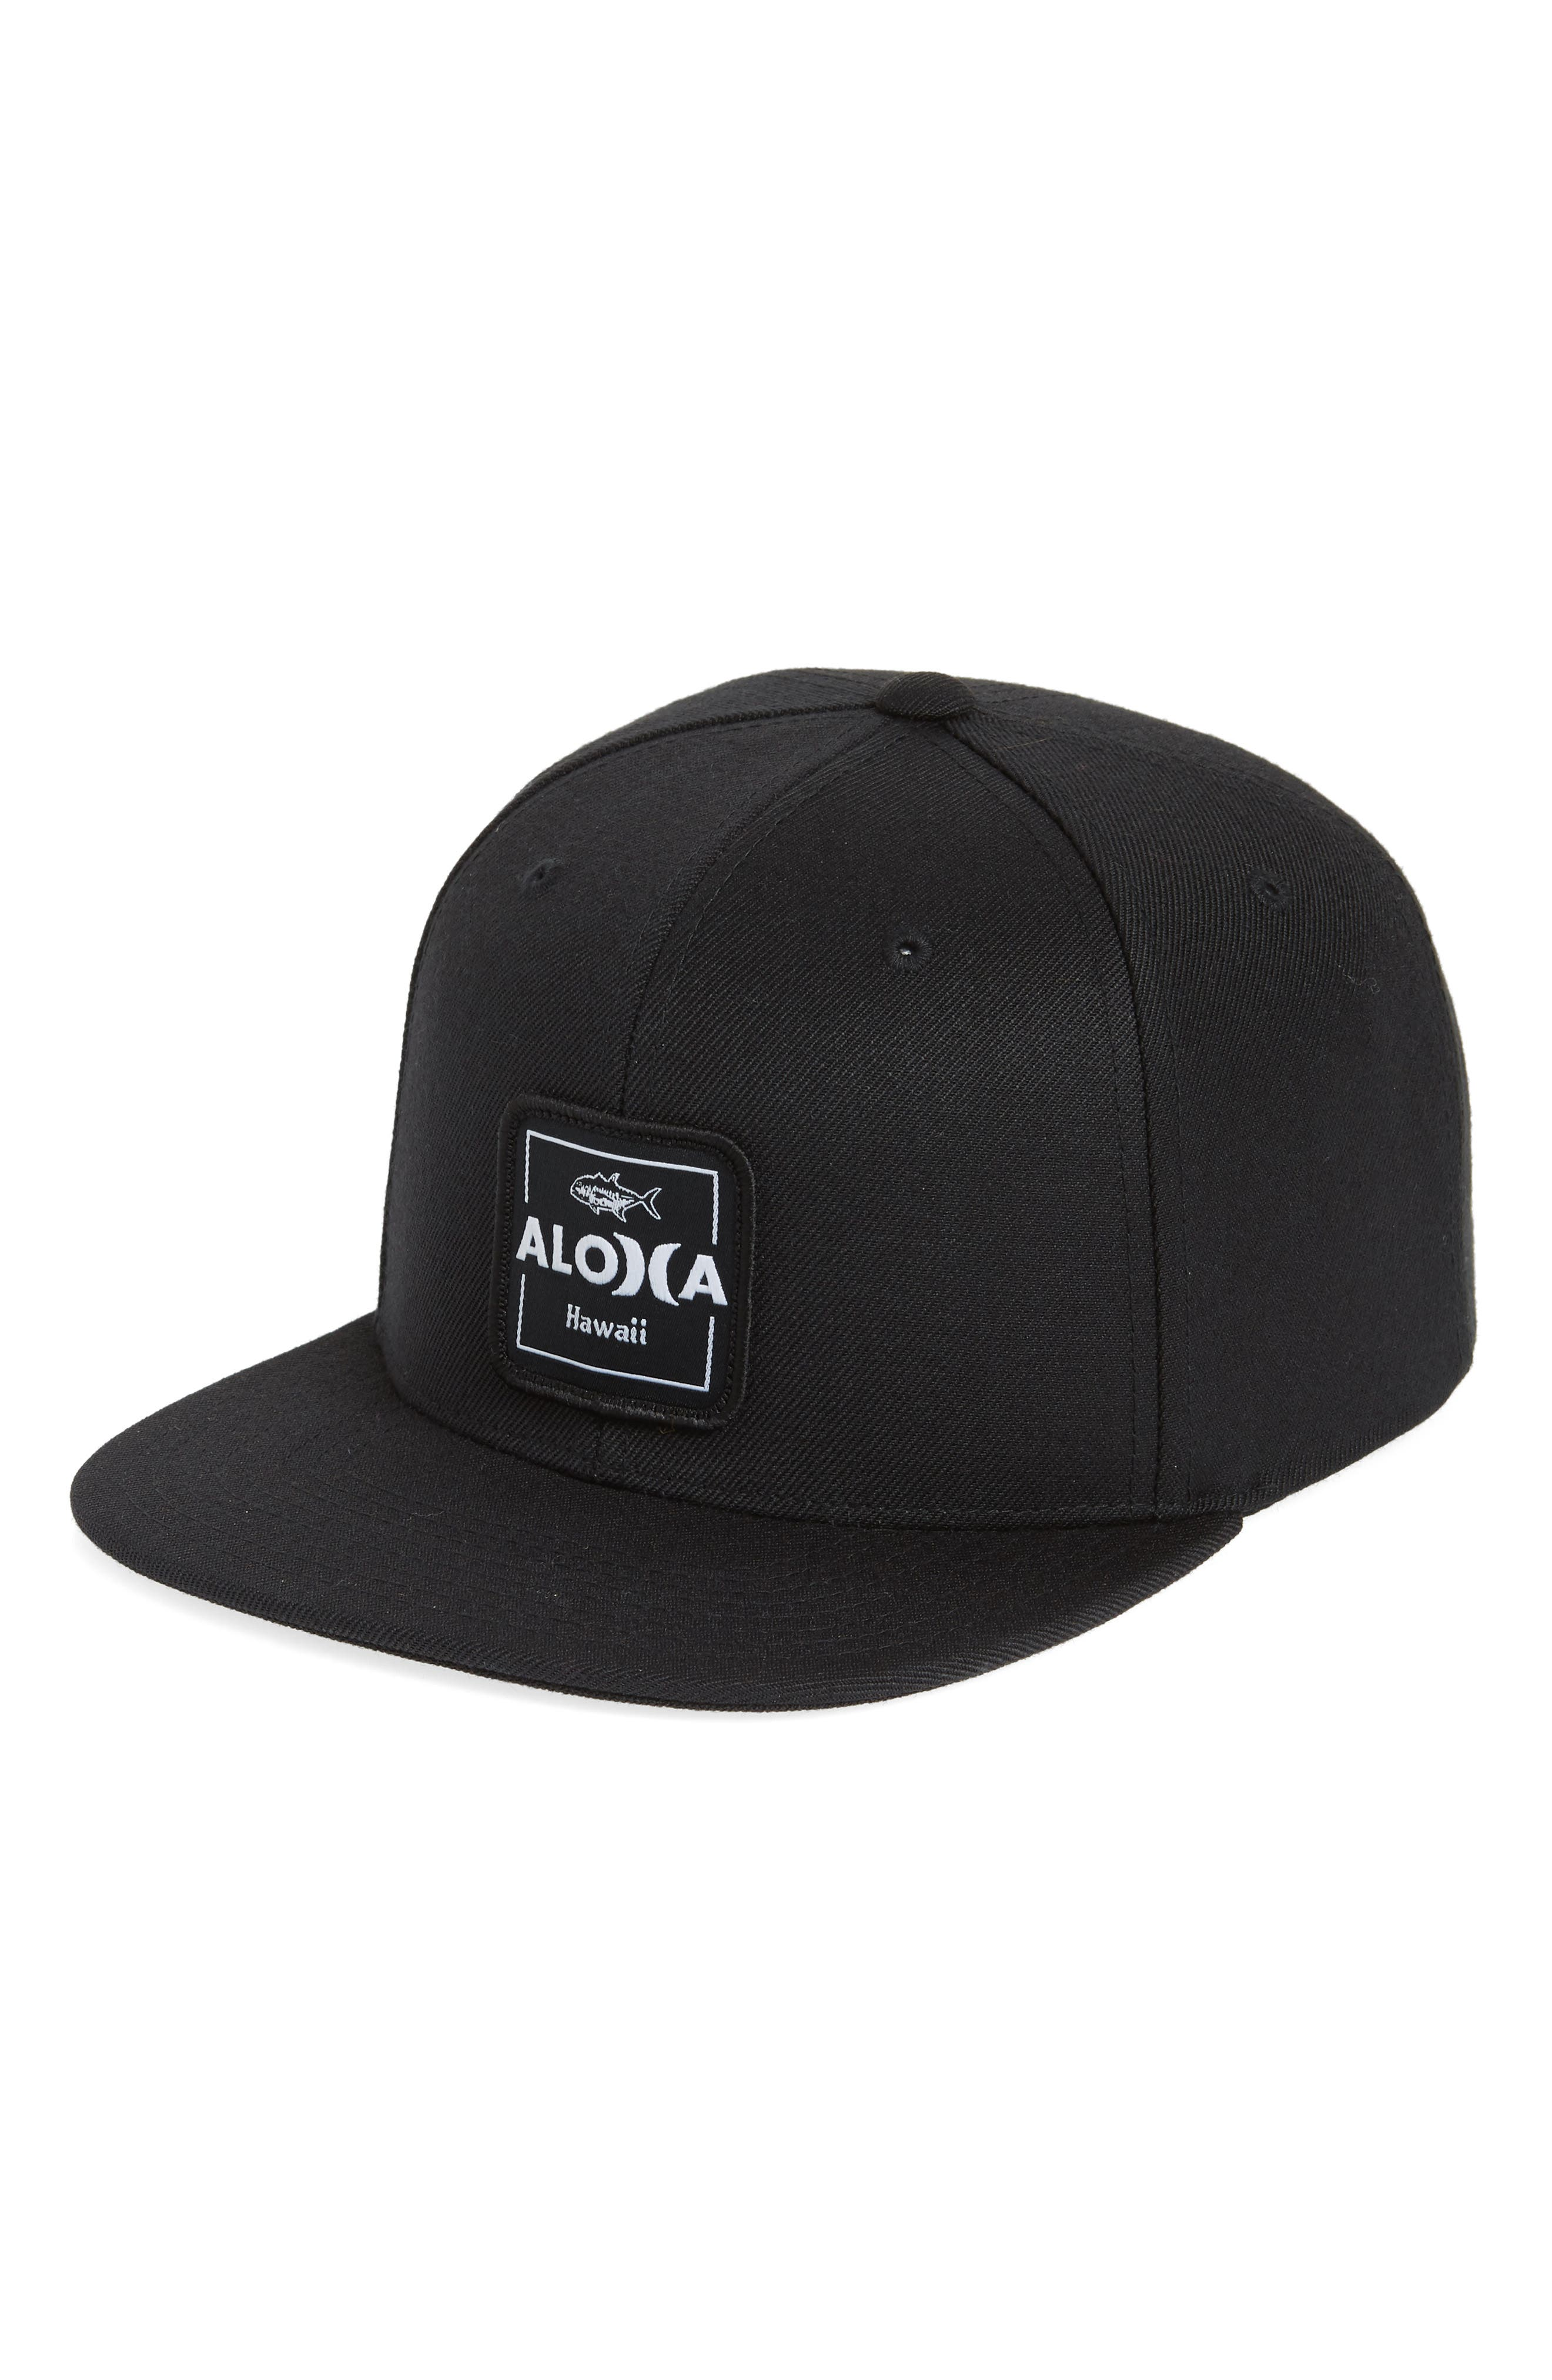 Aloha Cruiser 2 Cap,                         Main,                         color, 010